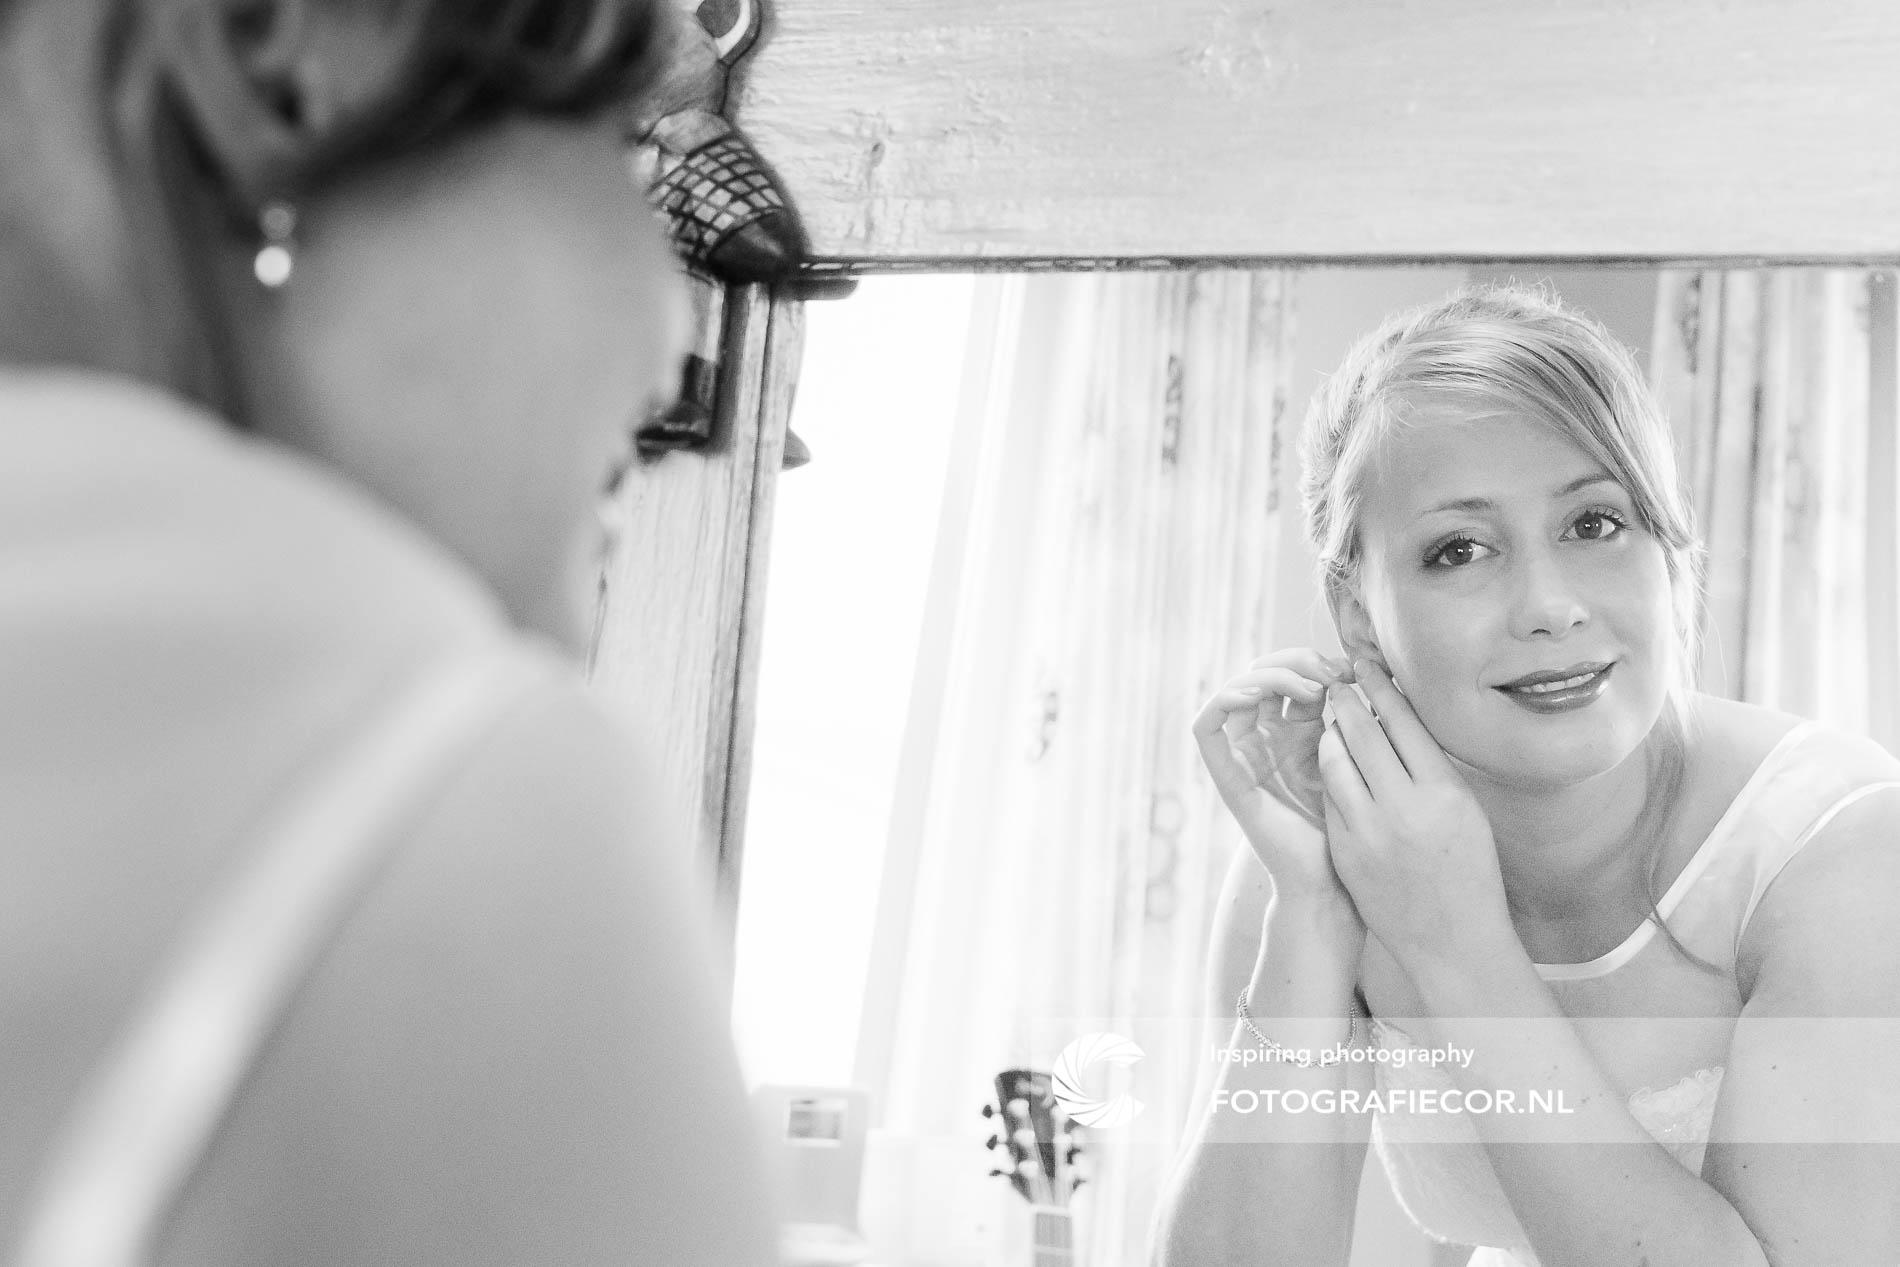 Trouwfoto's | bruidsfotograaf | Zelfportret in spiegel, Trouwen Kampen